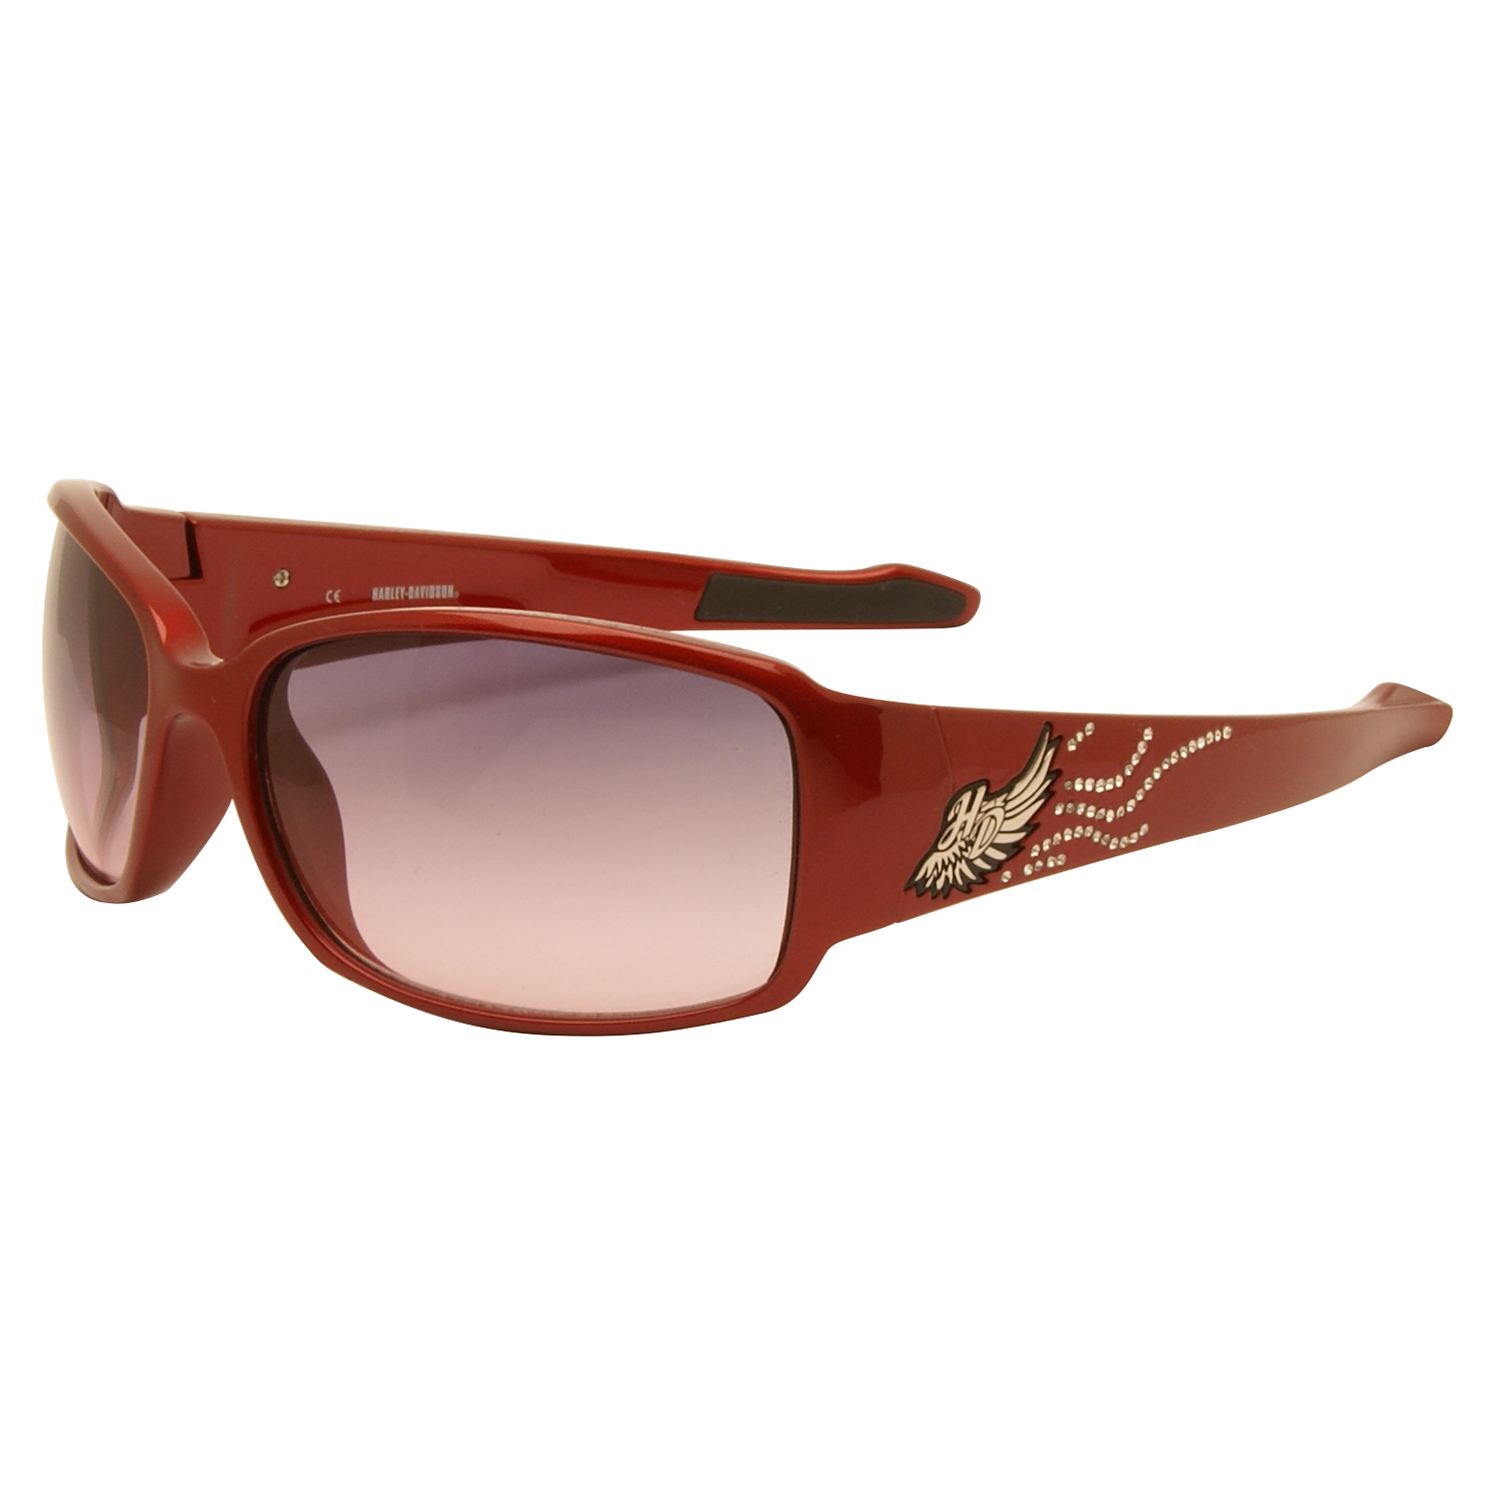 Harley Davidson – Metallic Red & Diamante Wraparound Style Sunglasses with Case